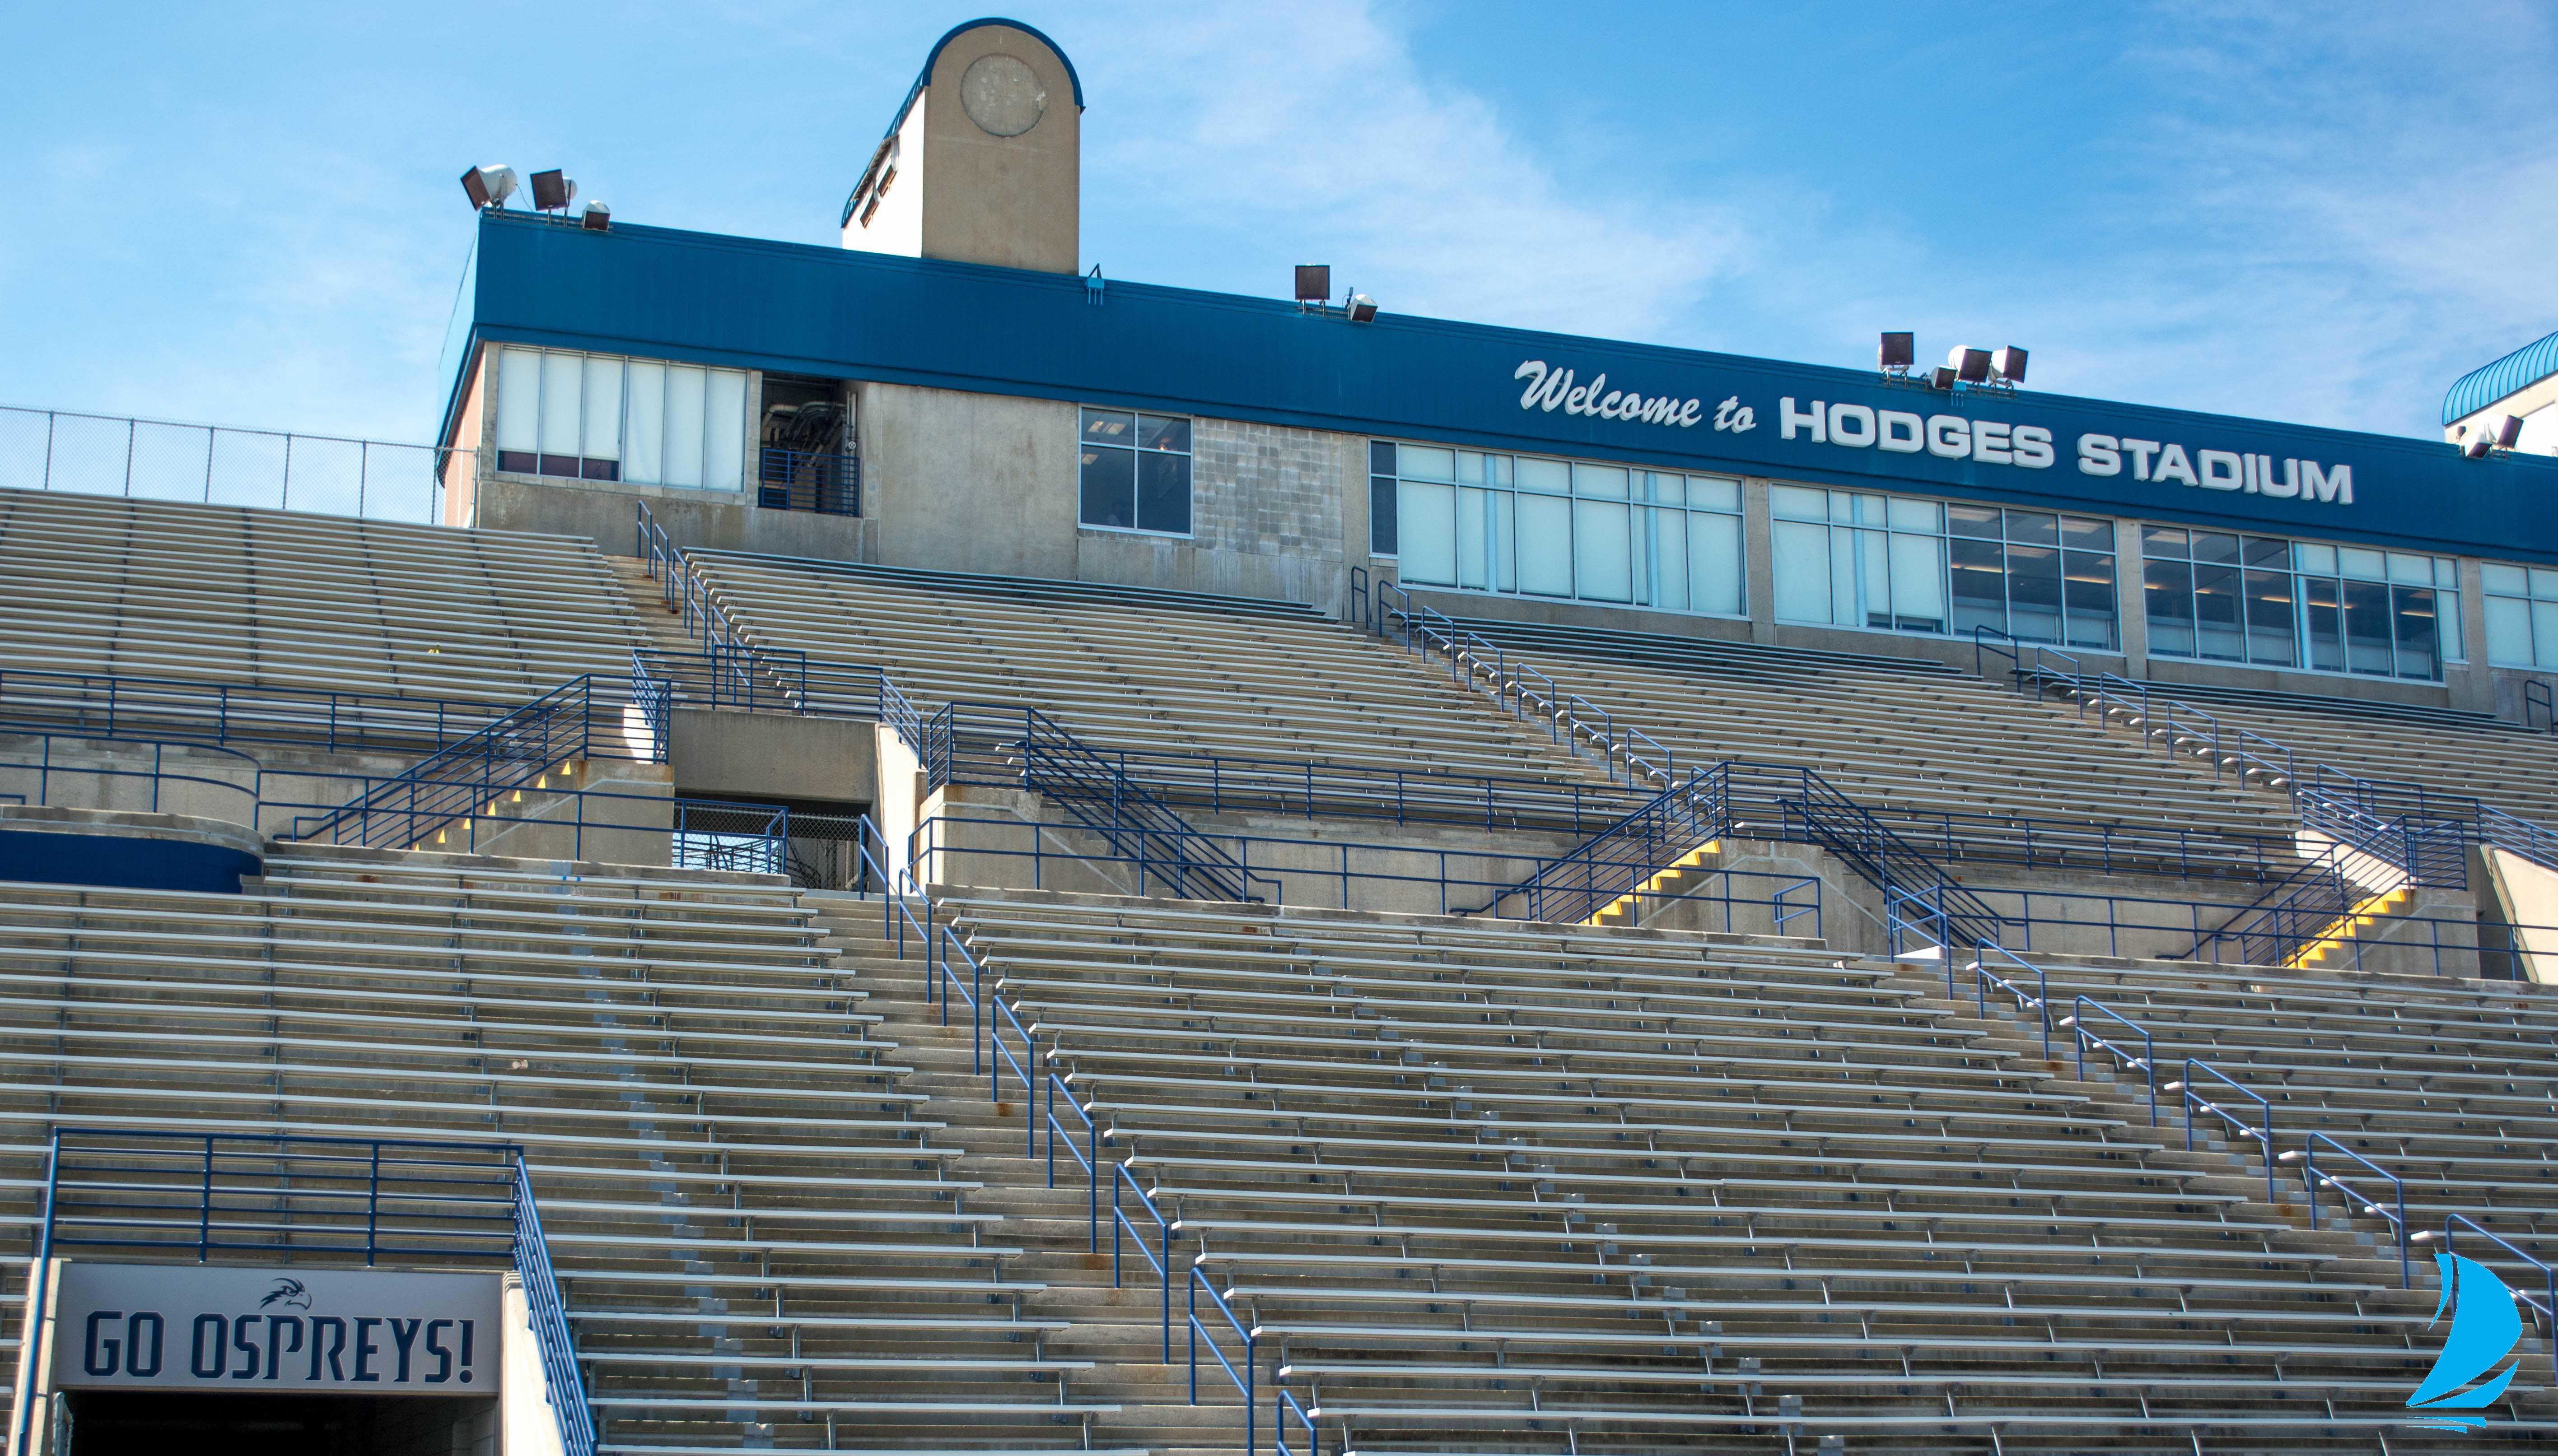 Hodges Stadium - unfospreys.com